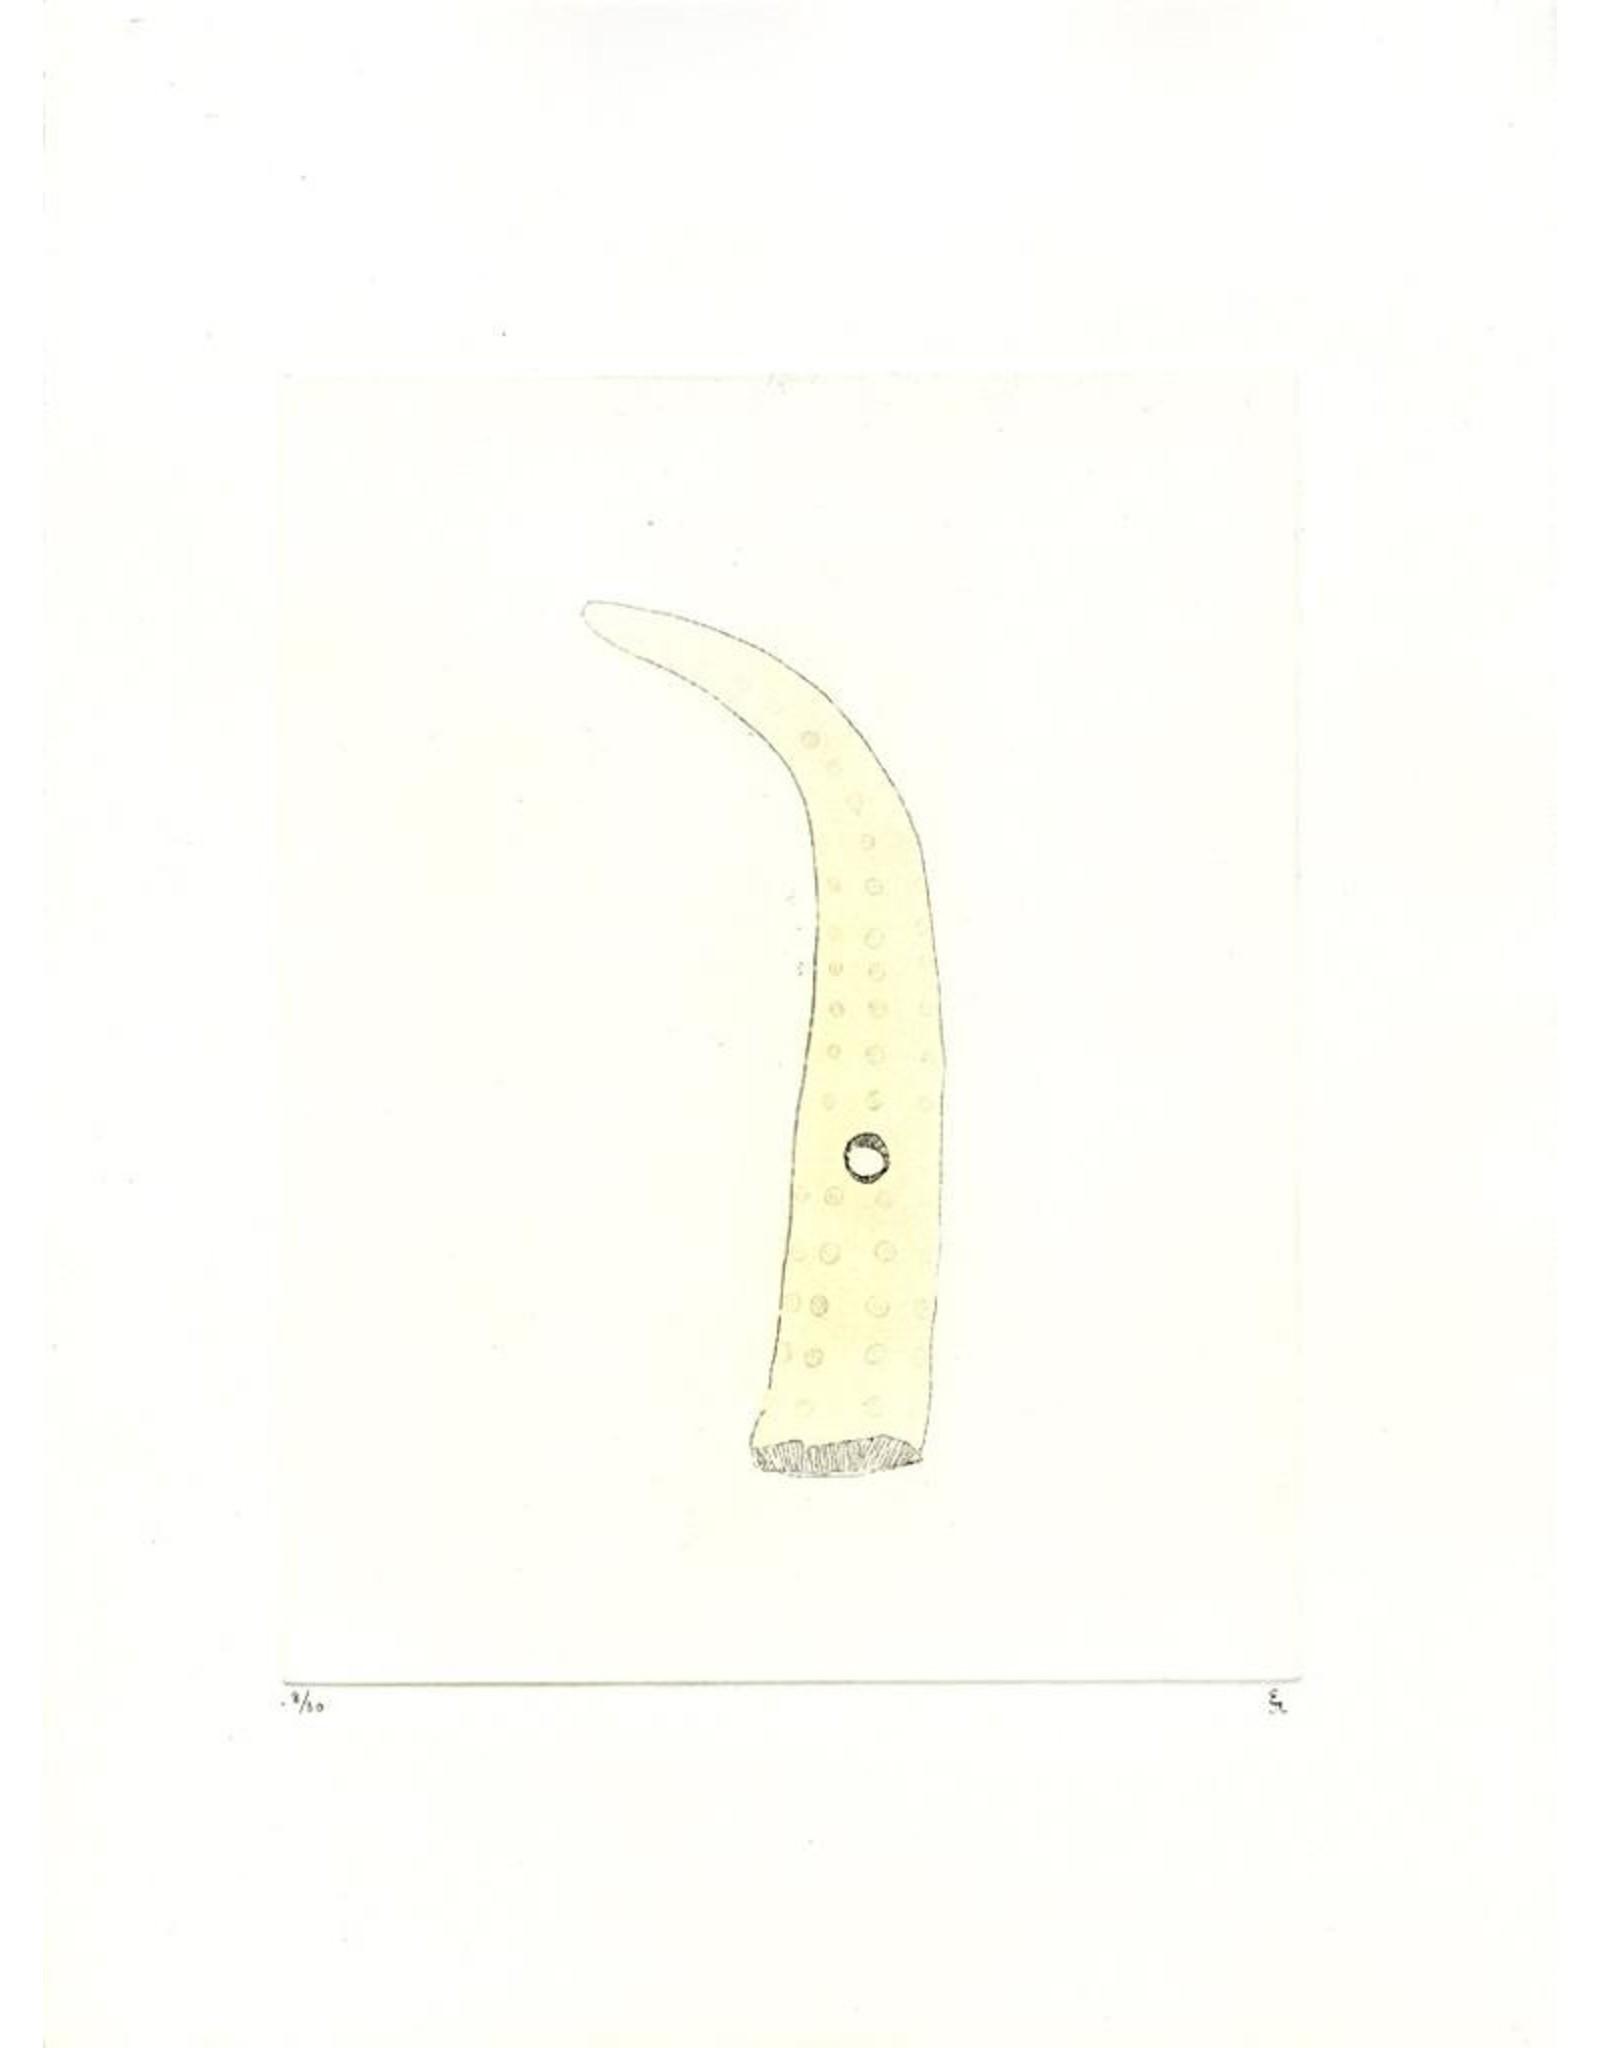 Josephson-Laidlaw, Erin Bone (from Some Specimens series)